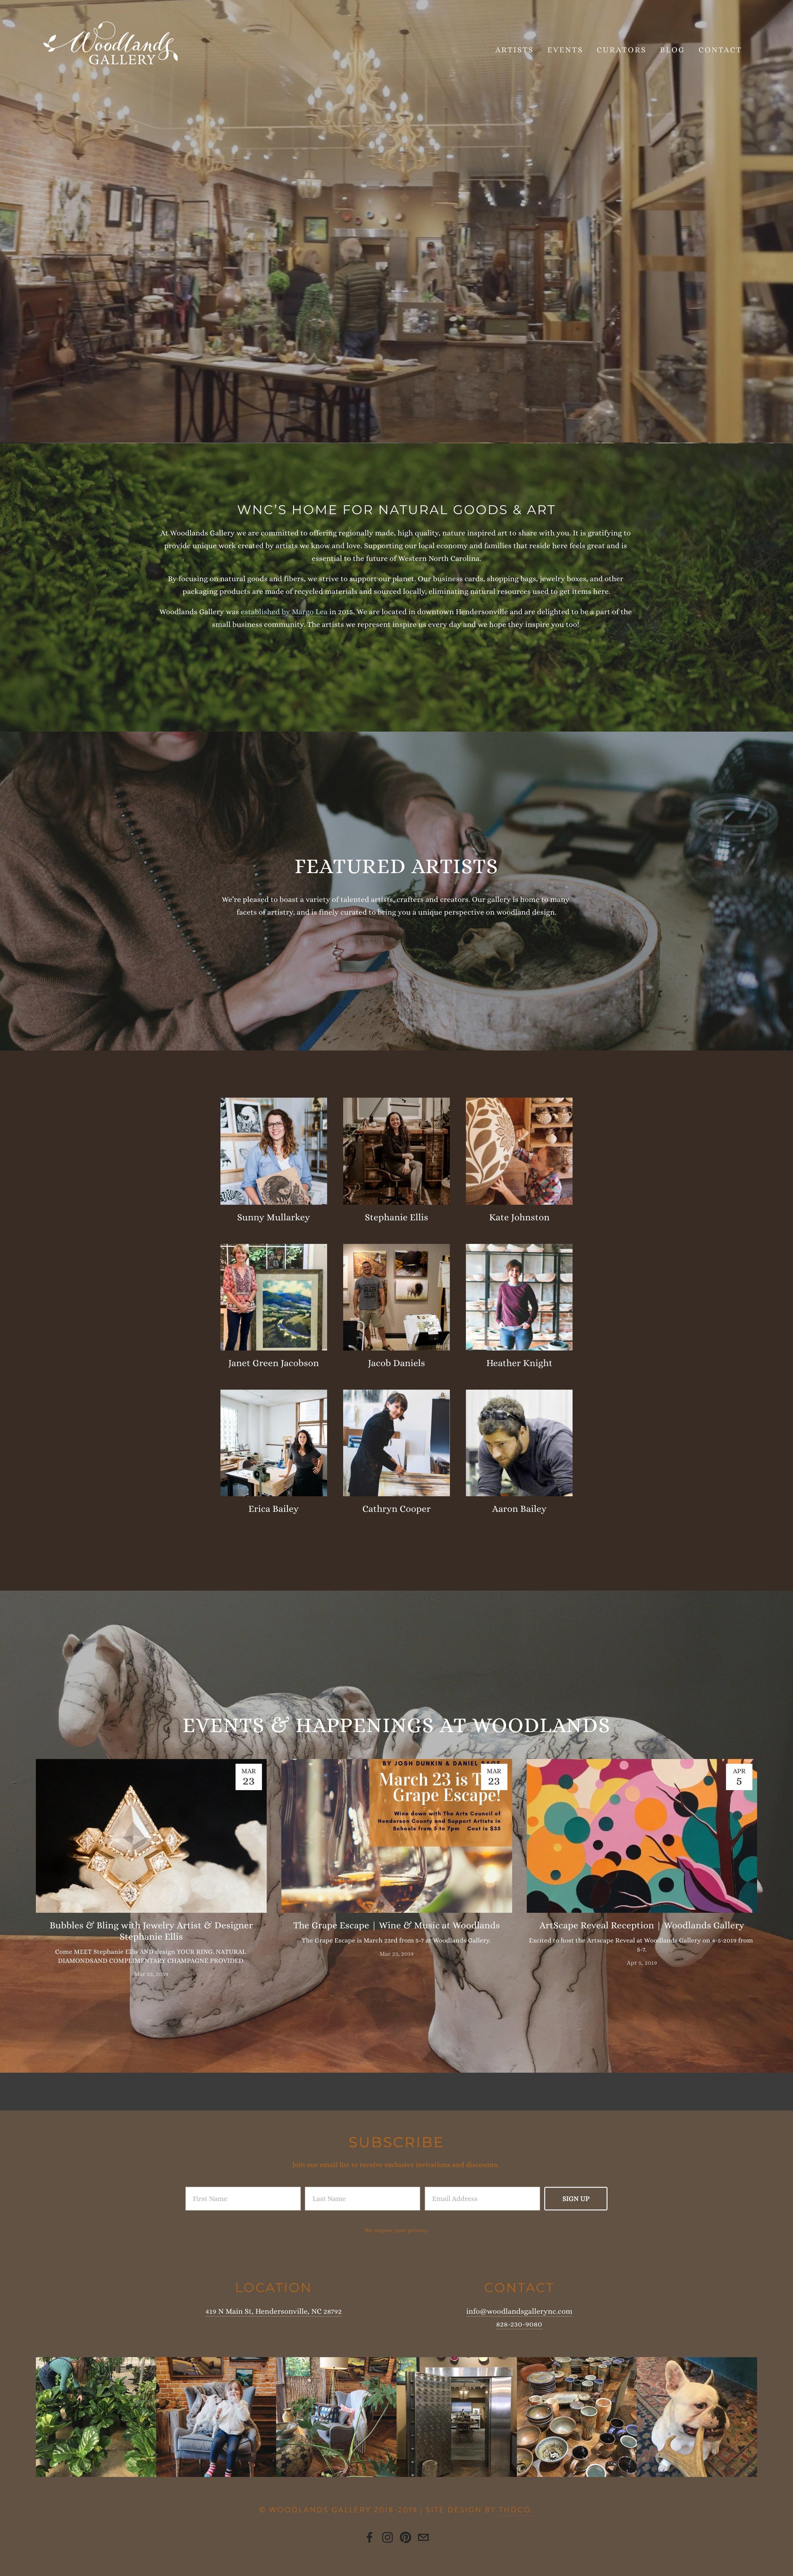 screencapture-woodlandsgallerync-2019-02-02-10_34_51.jpg